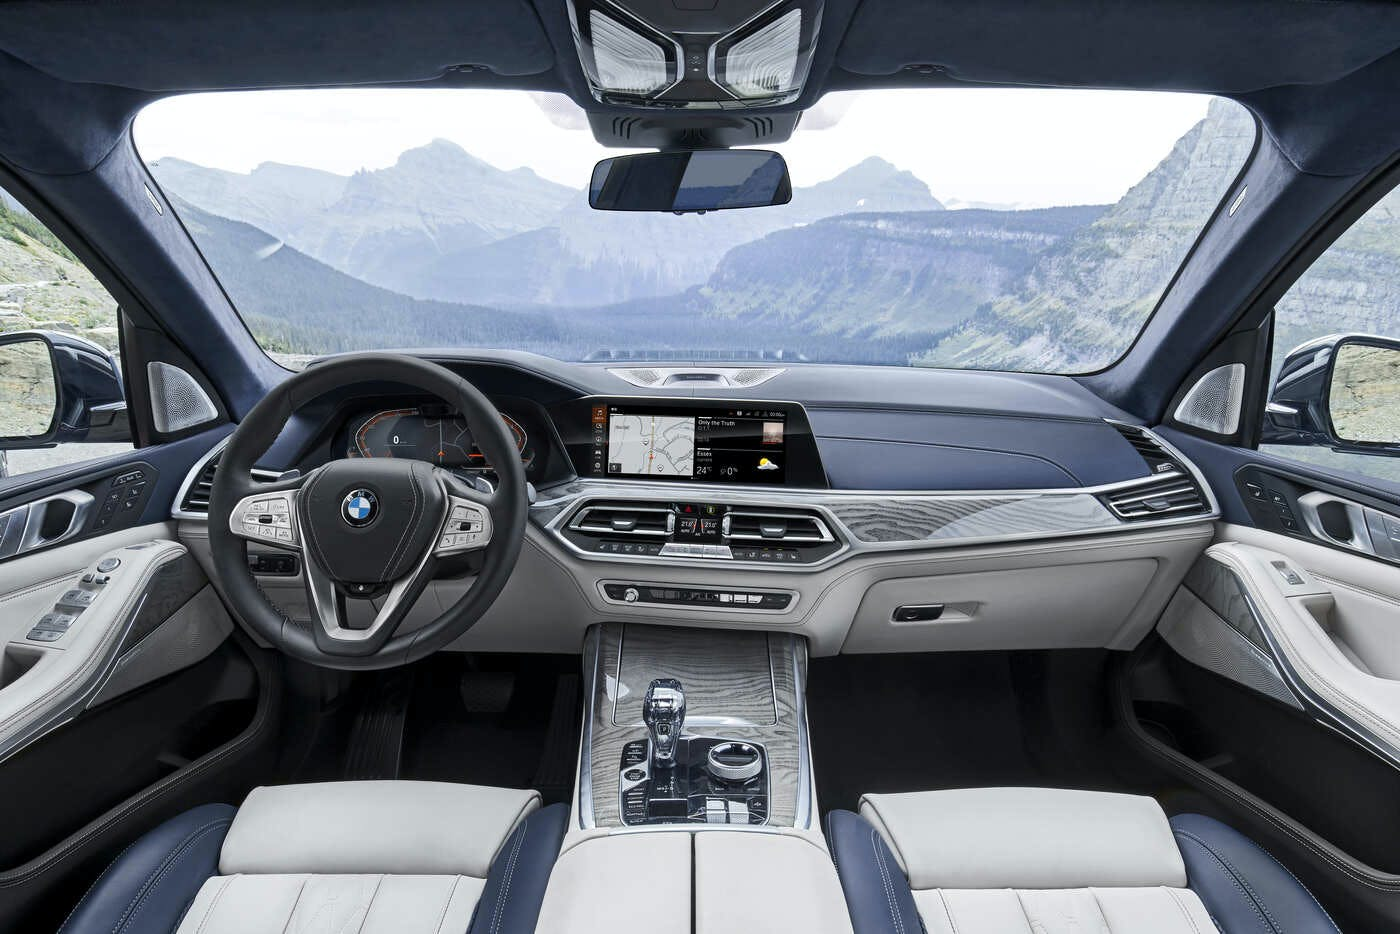 2020 BMW X7 Series as a Luxury SUV